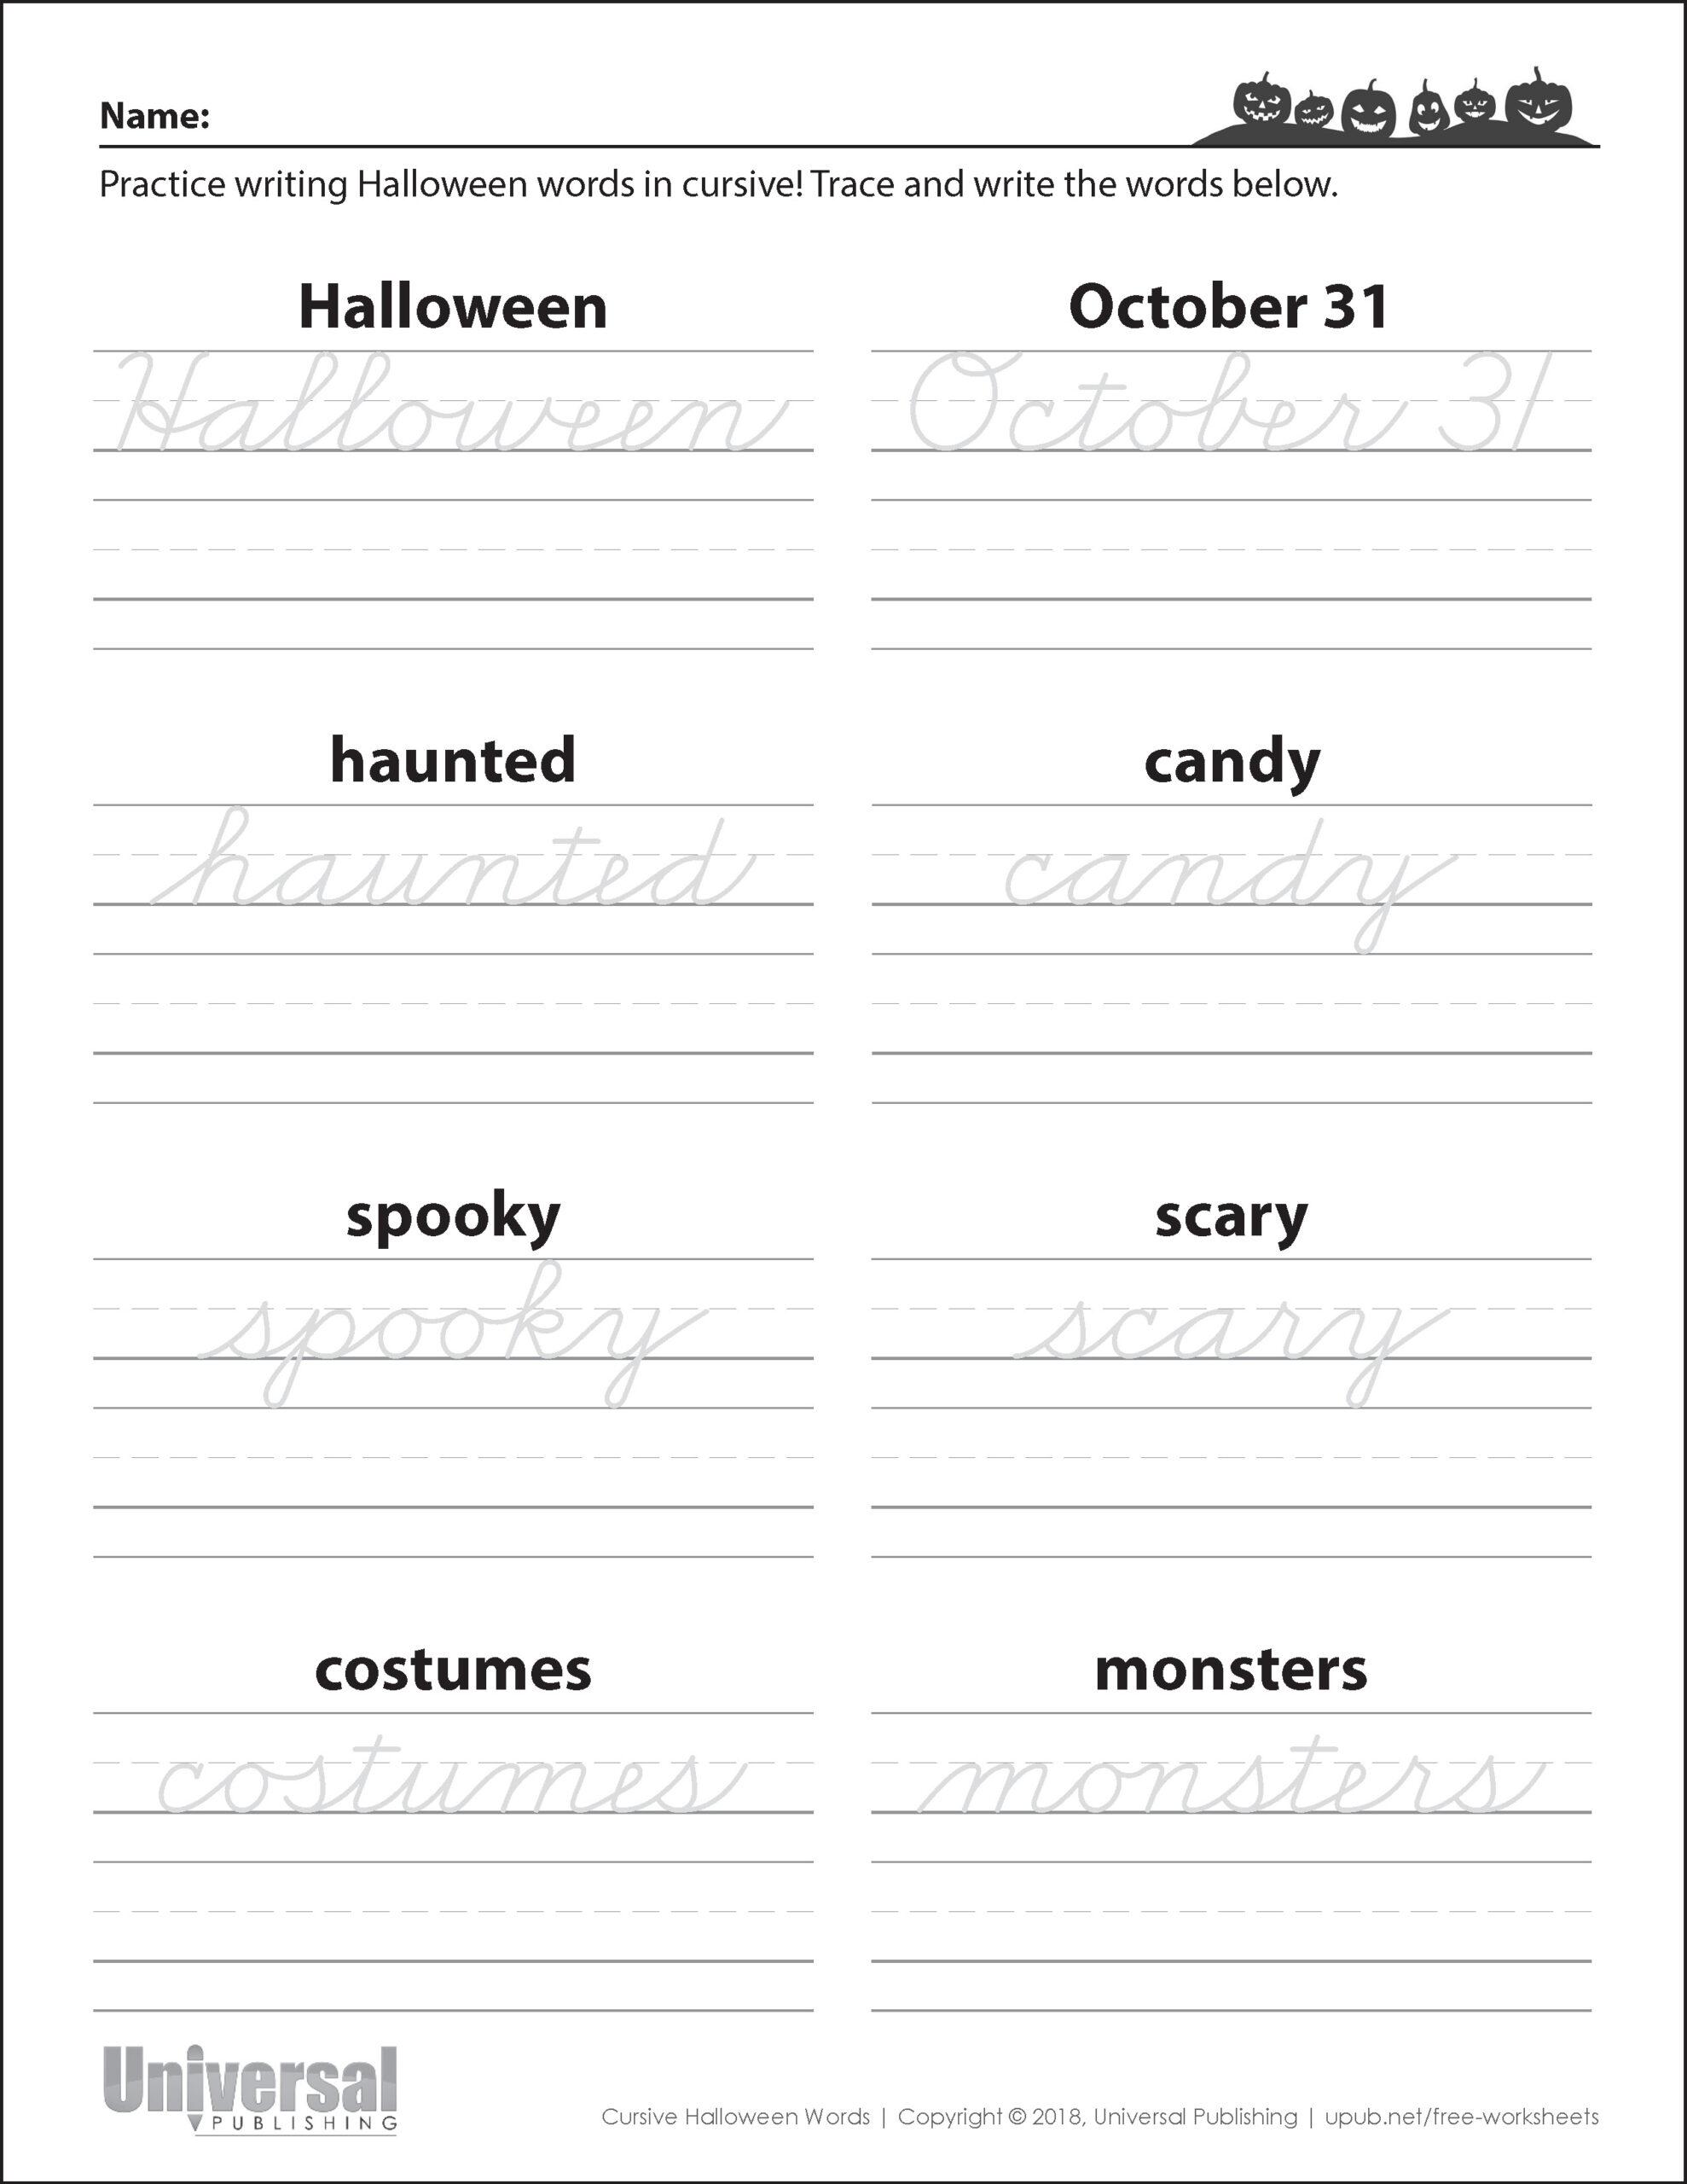 Halloween Words Cursive - Universal Publishing Blog